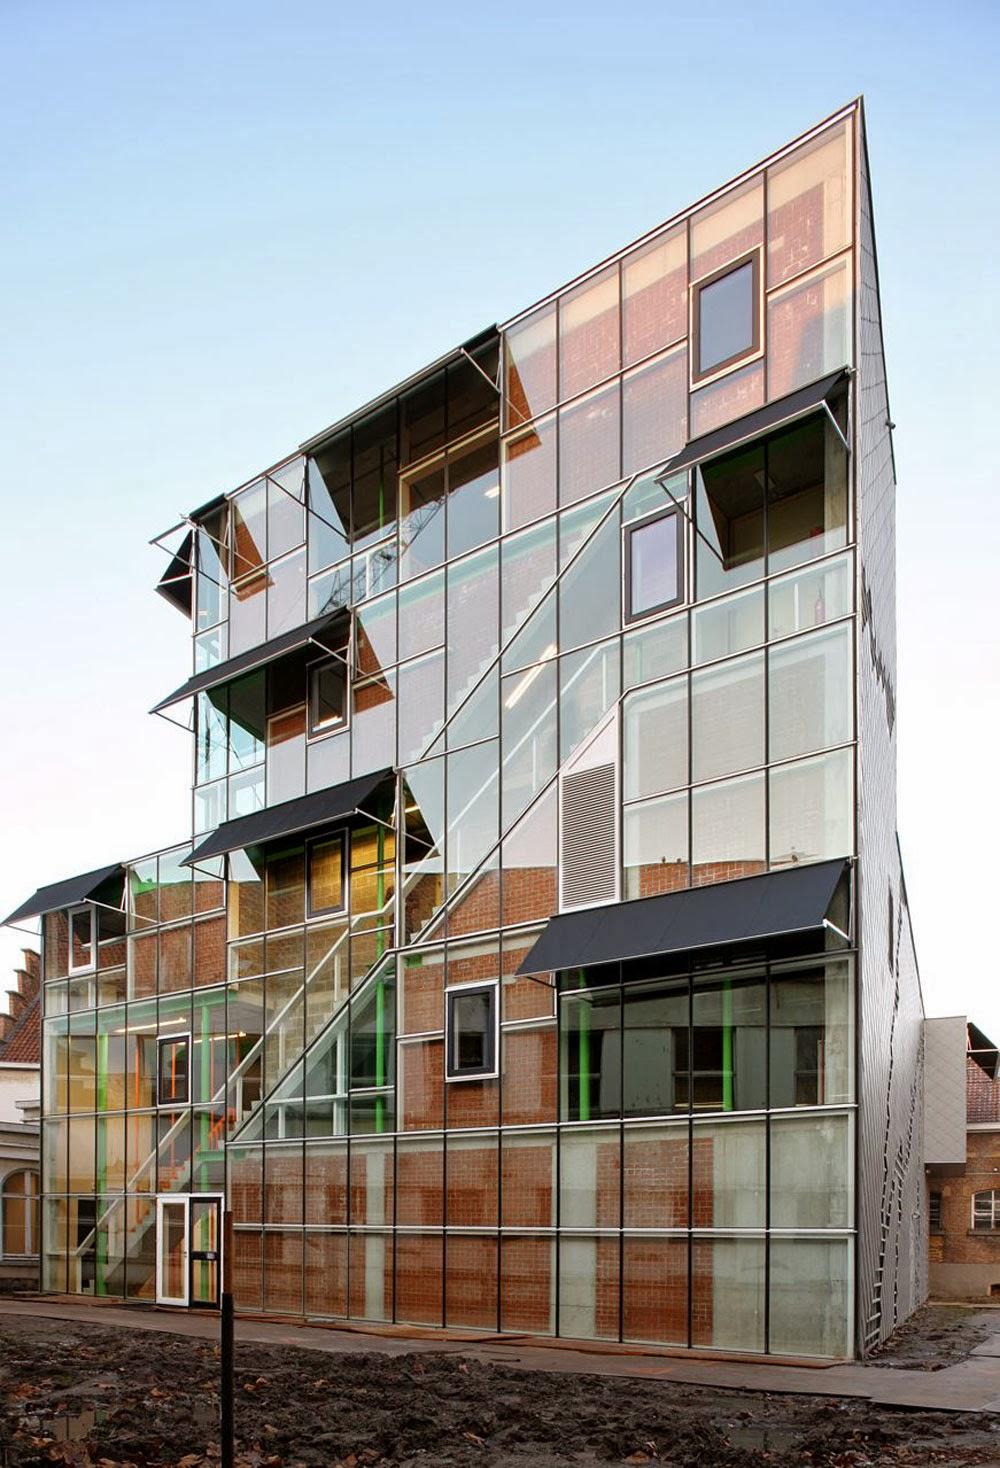 Edificio Dentro de Otro Edificio - LOD   [ Arte+ ]